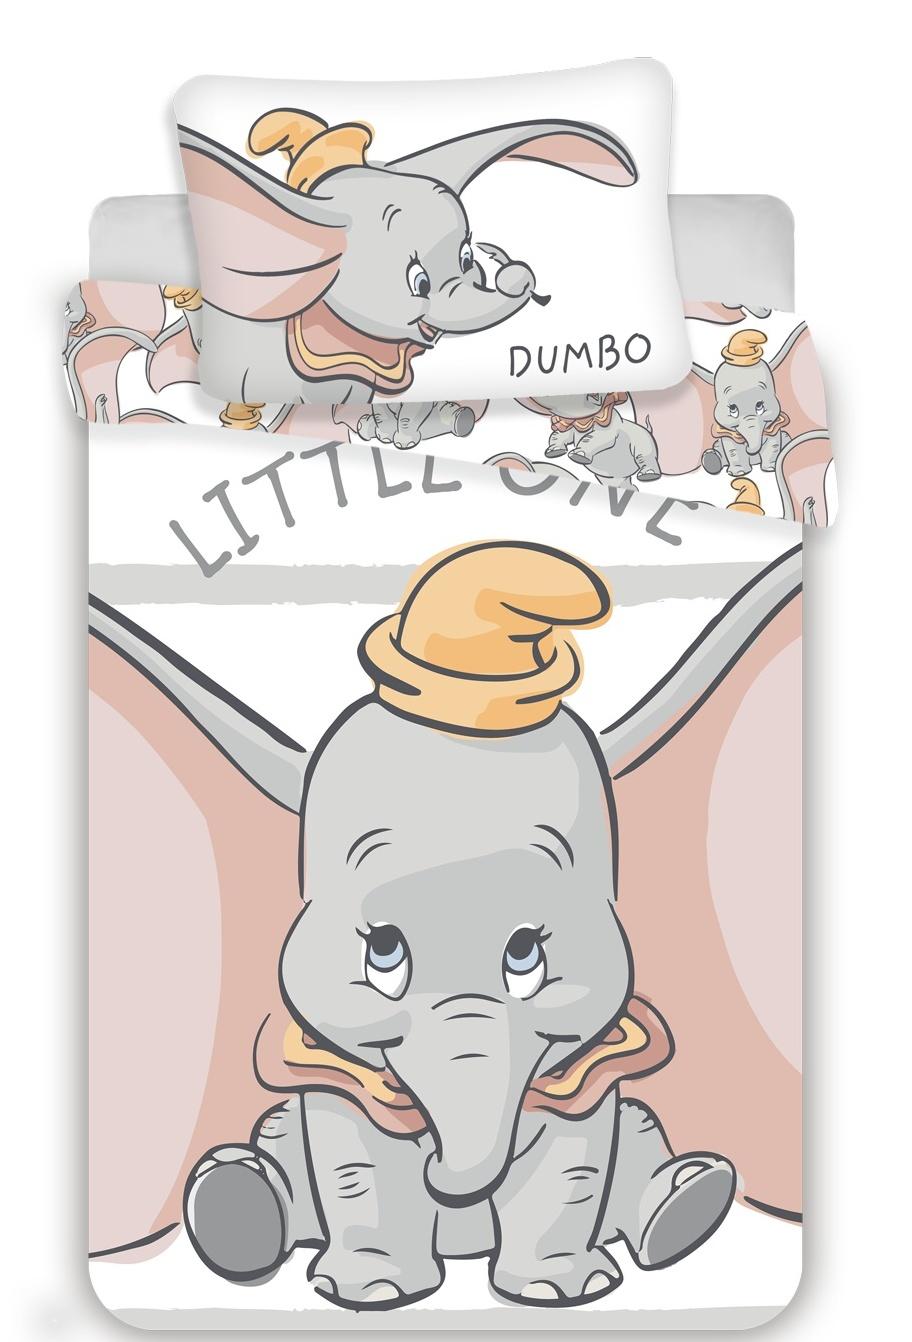 Disney povlečení do postýlky Dumbo stripe baby 100x135, 60x40 cm